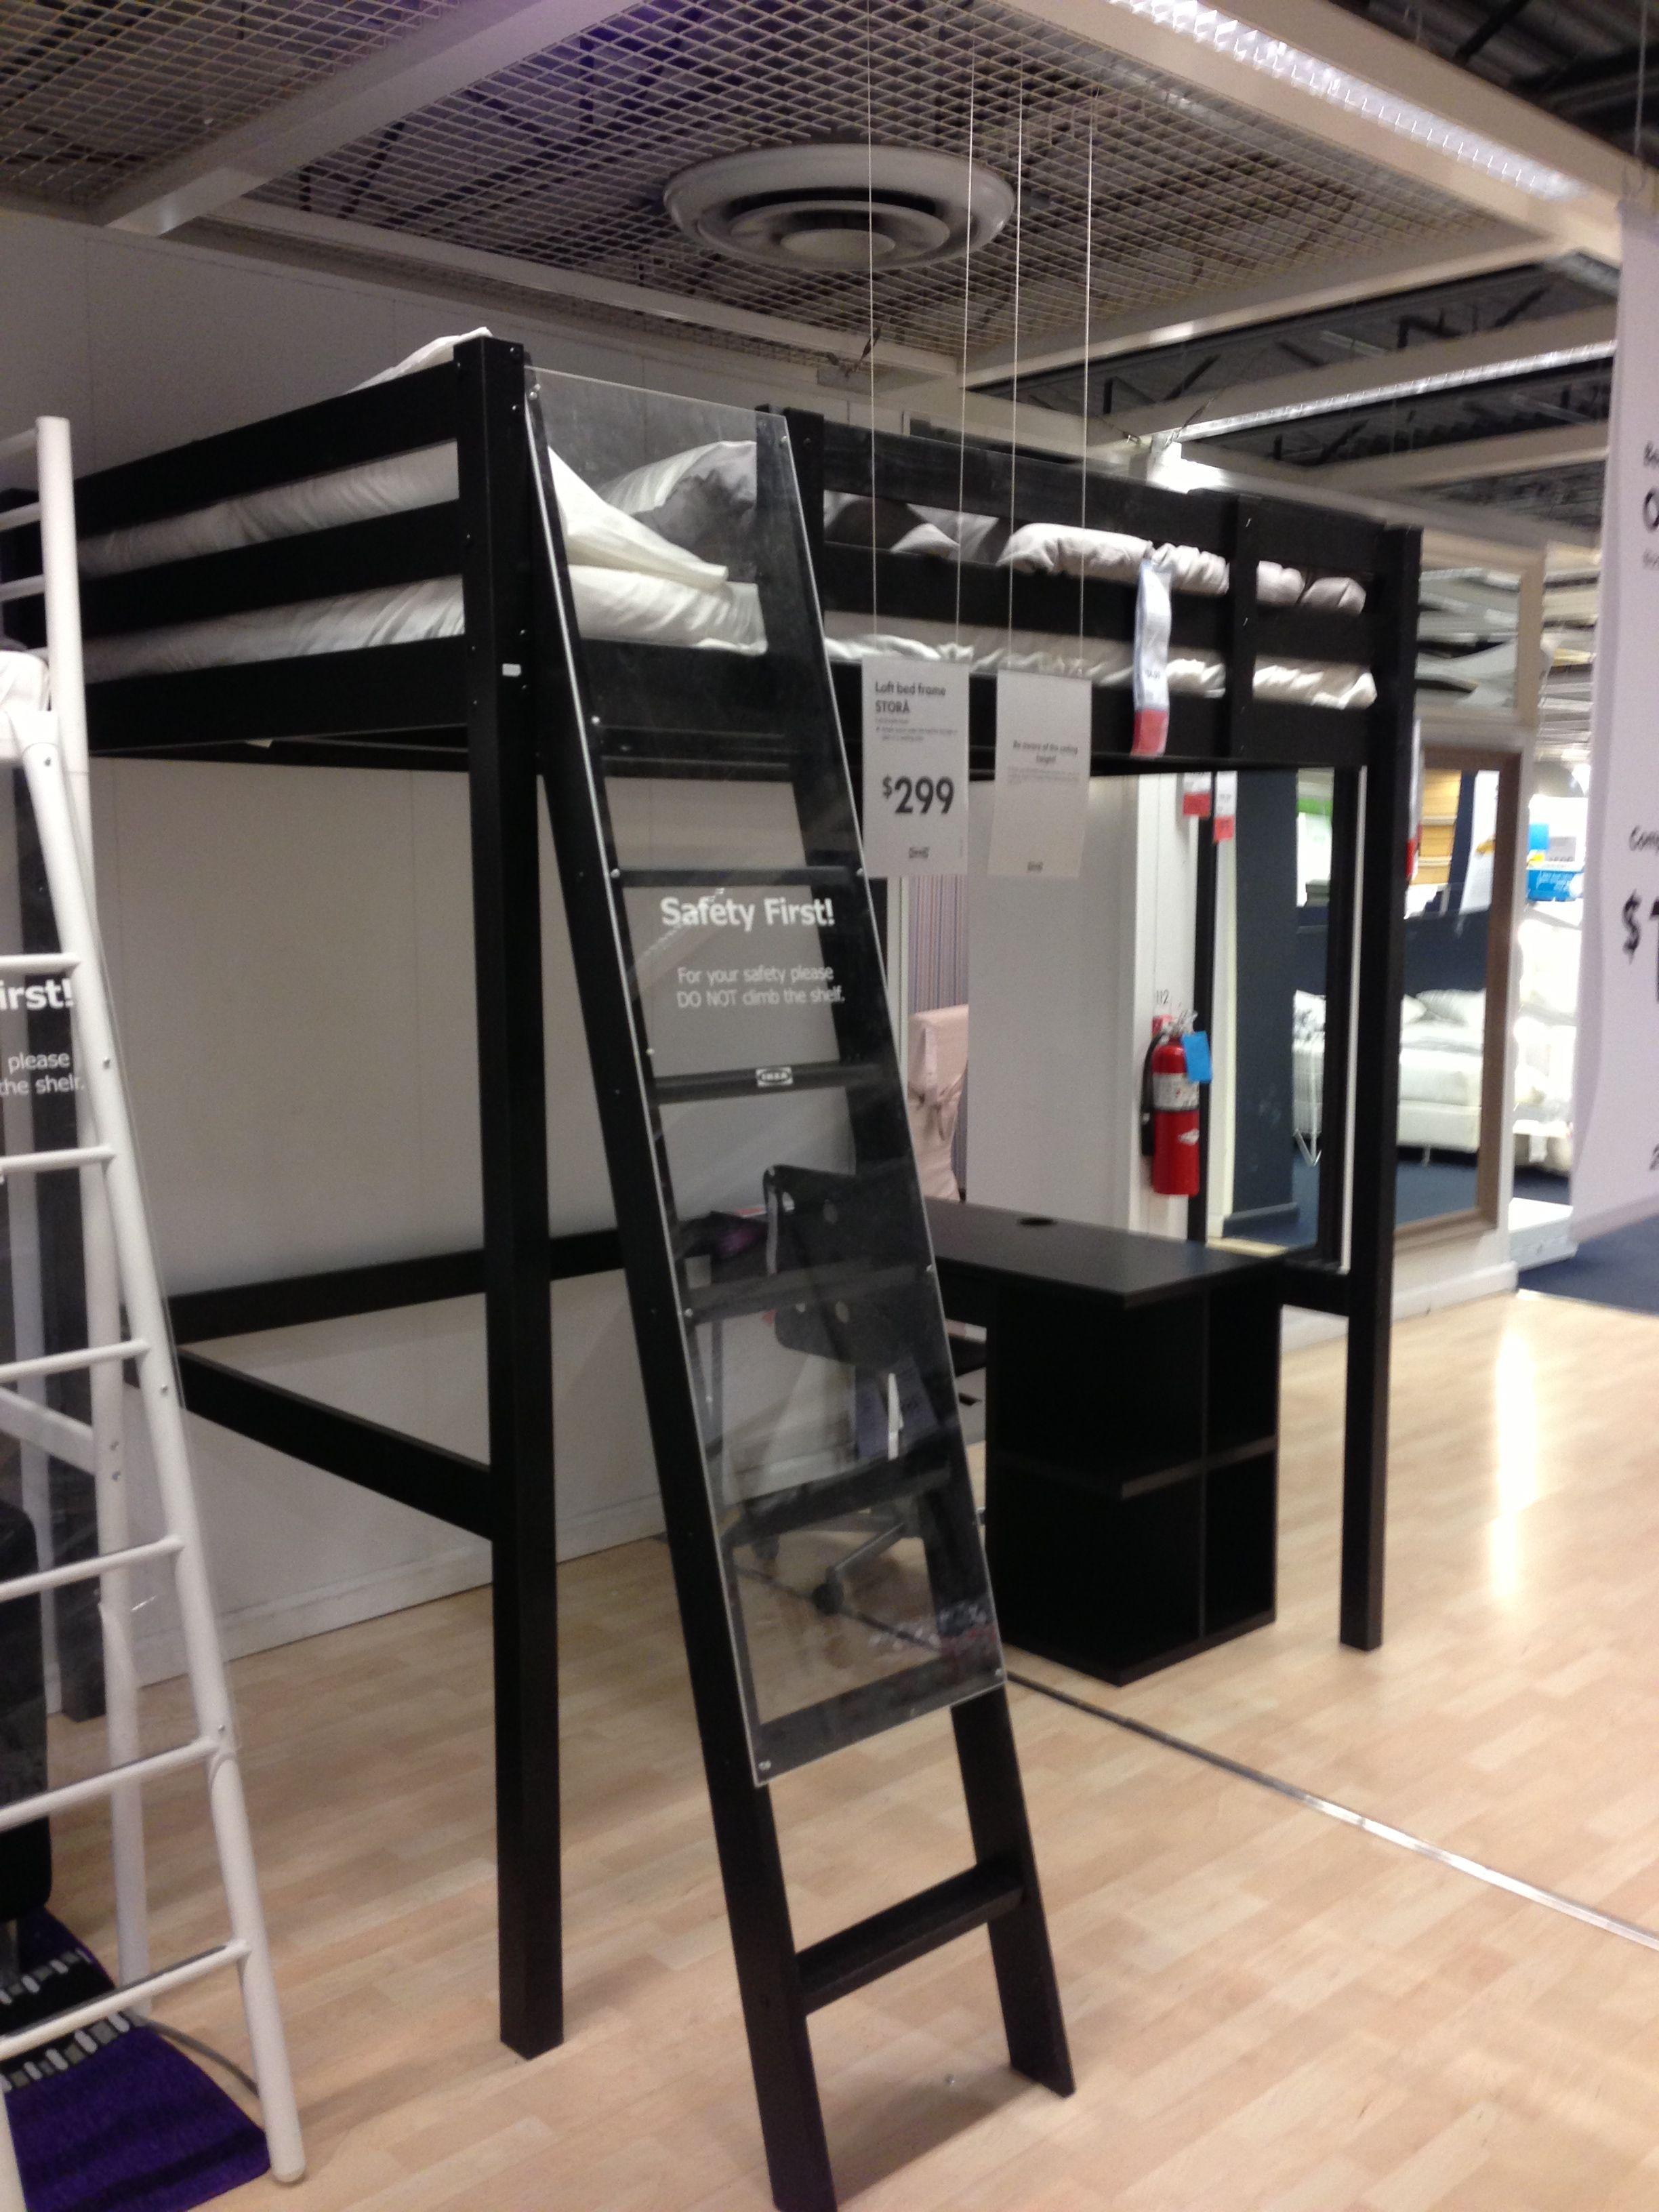 Stora Loft Bed Frame 299 Ikea Inspiration Pinterest